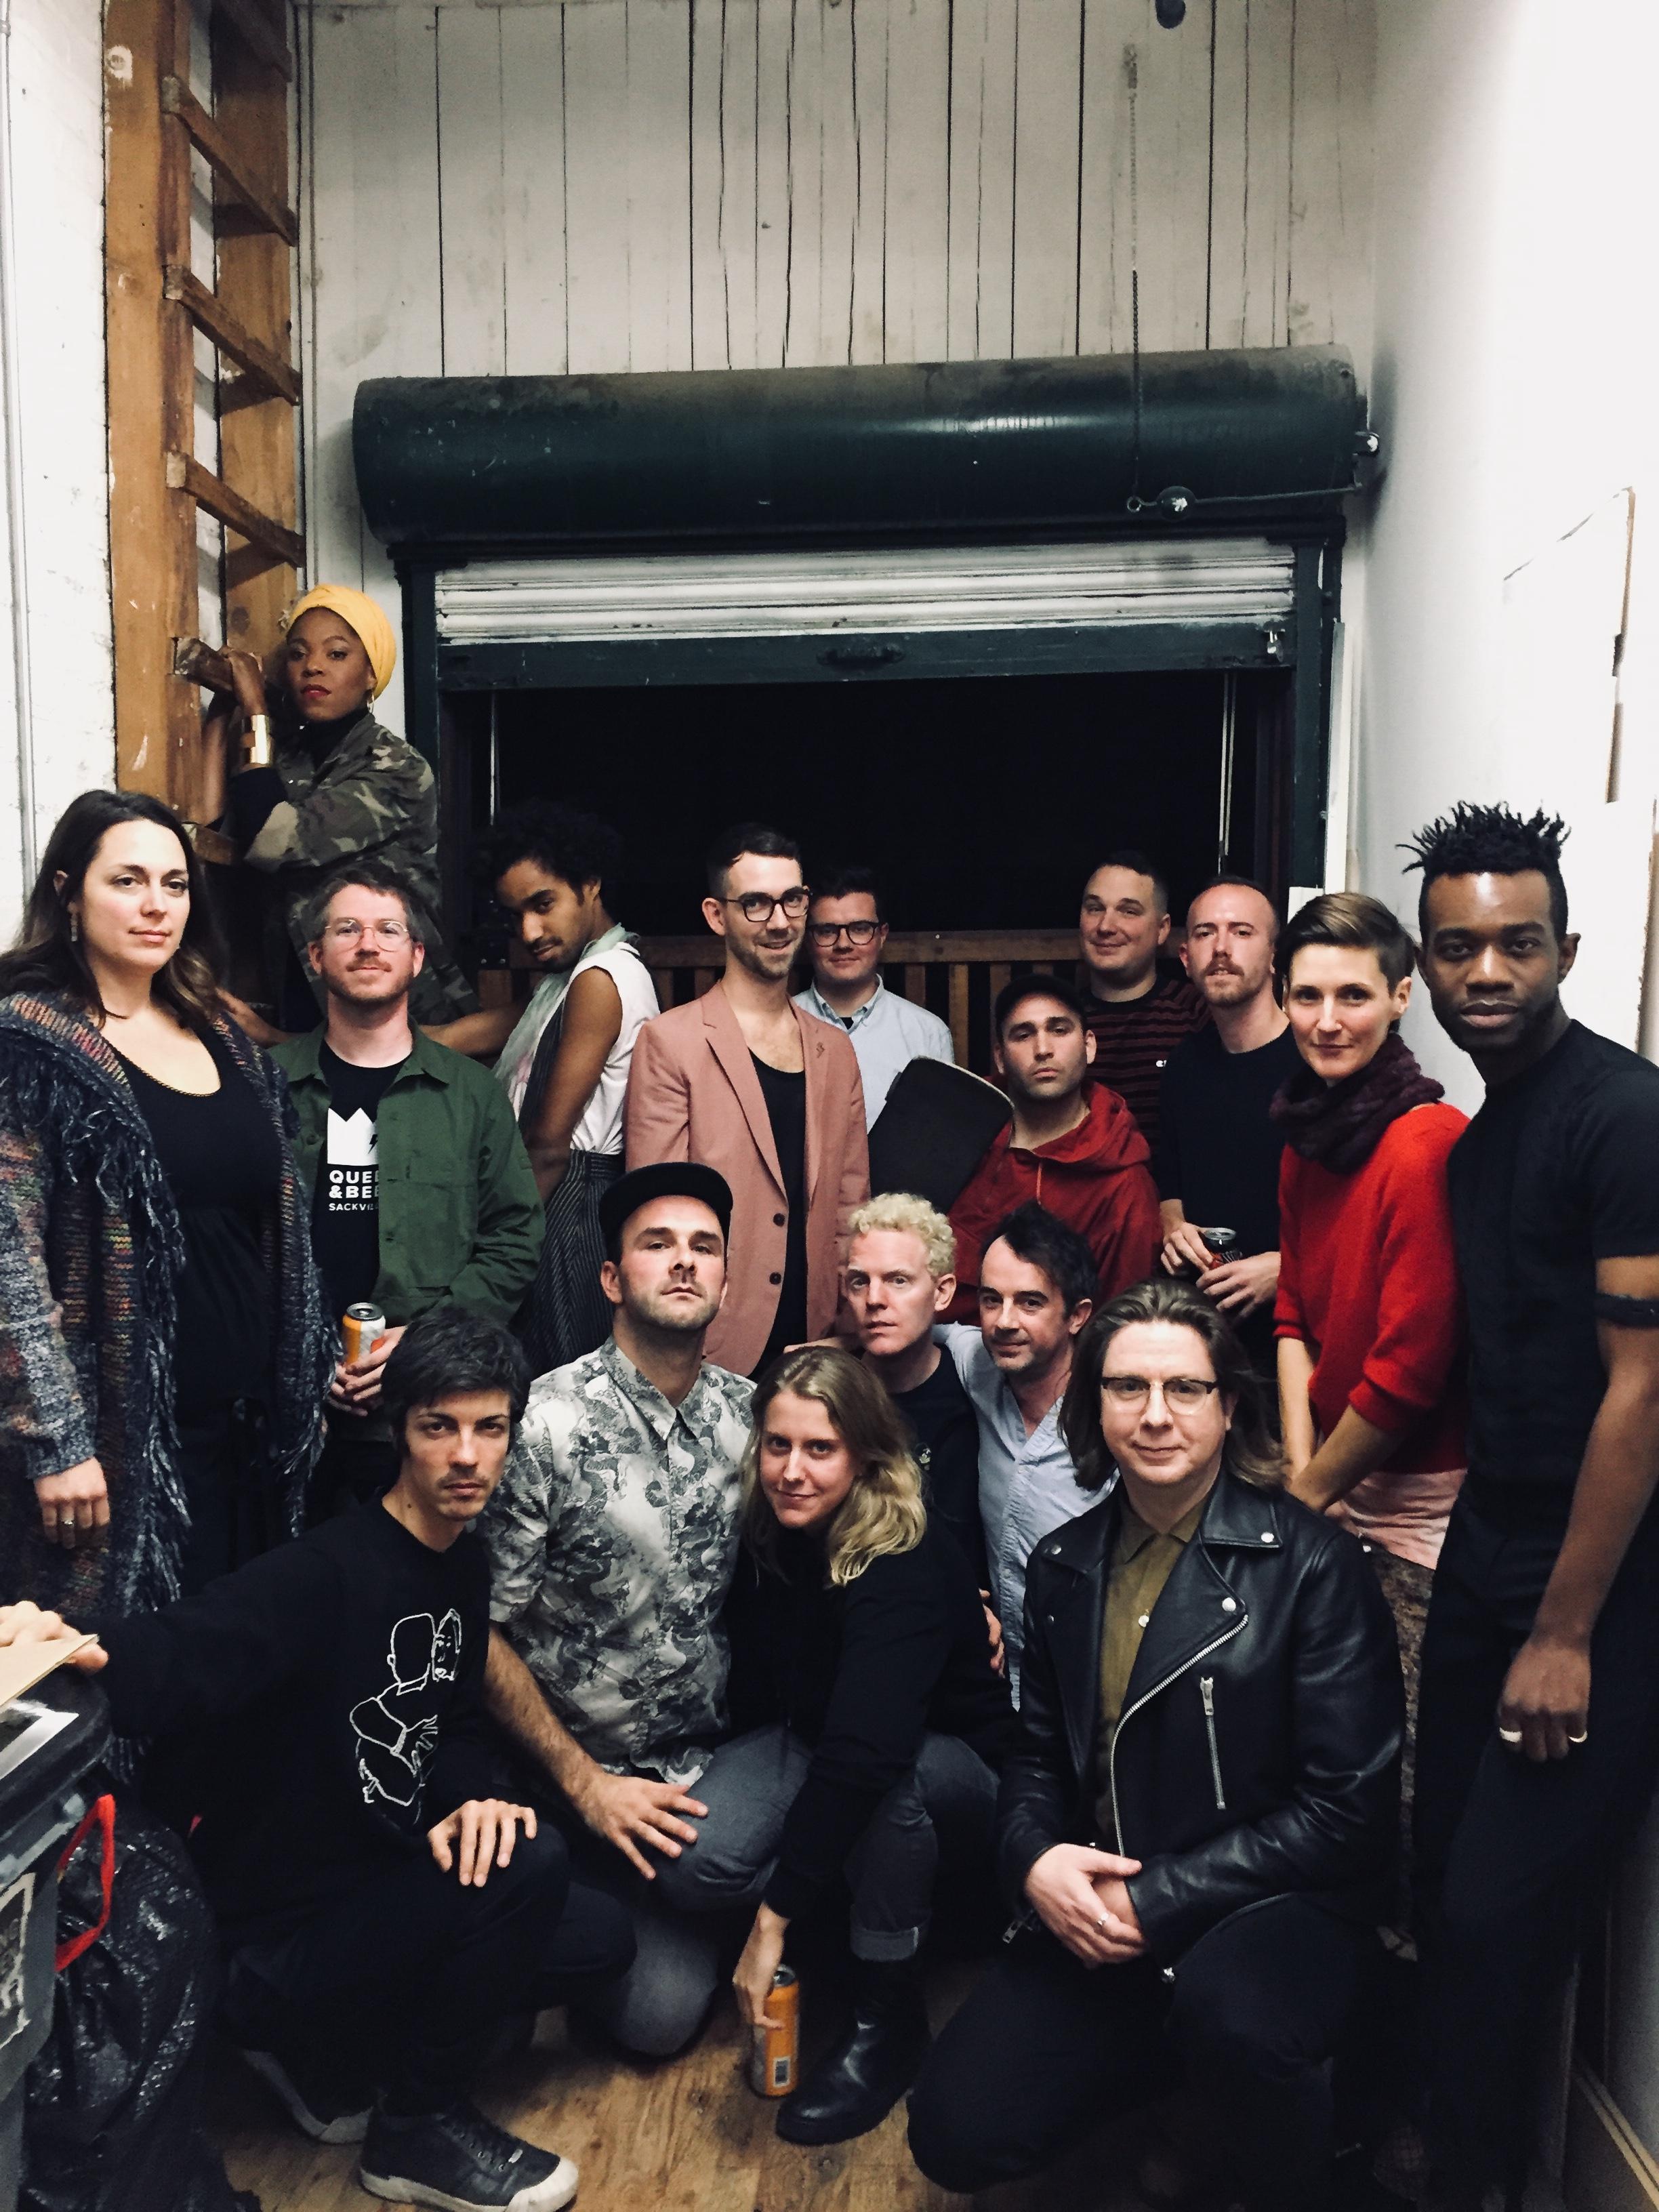 Jam Factory, Toronto, Ontario. November 4, 2018.